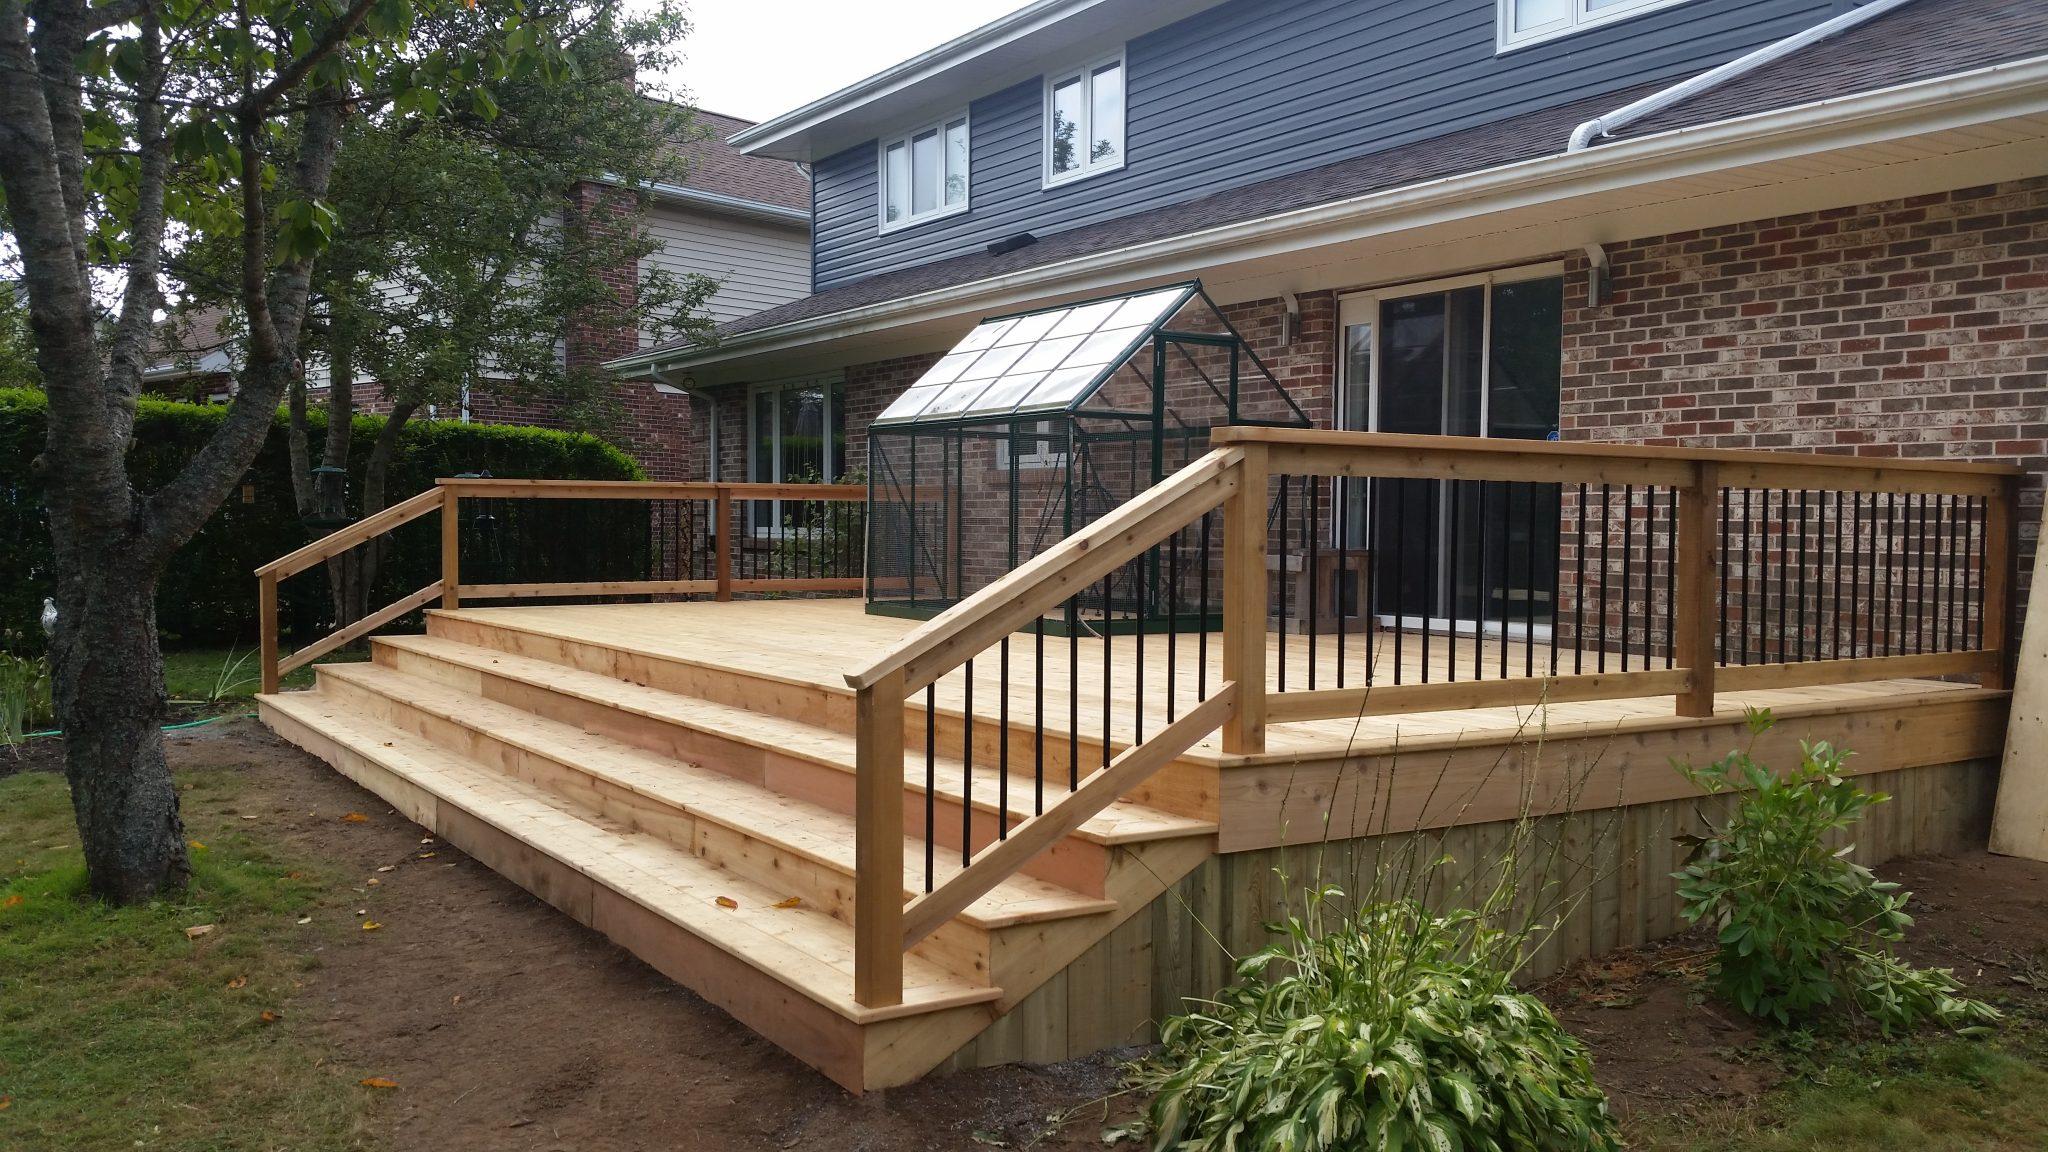 Small Backyard Decks Back Porch Design Ideas - House Plans